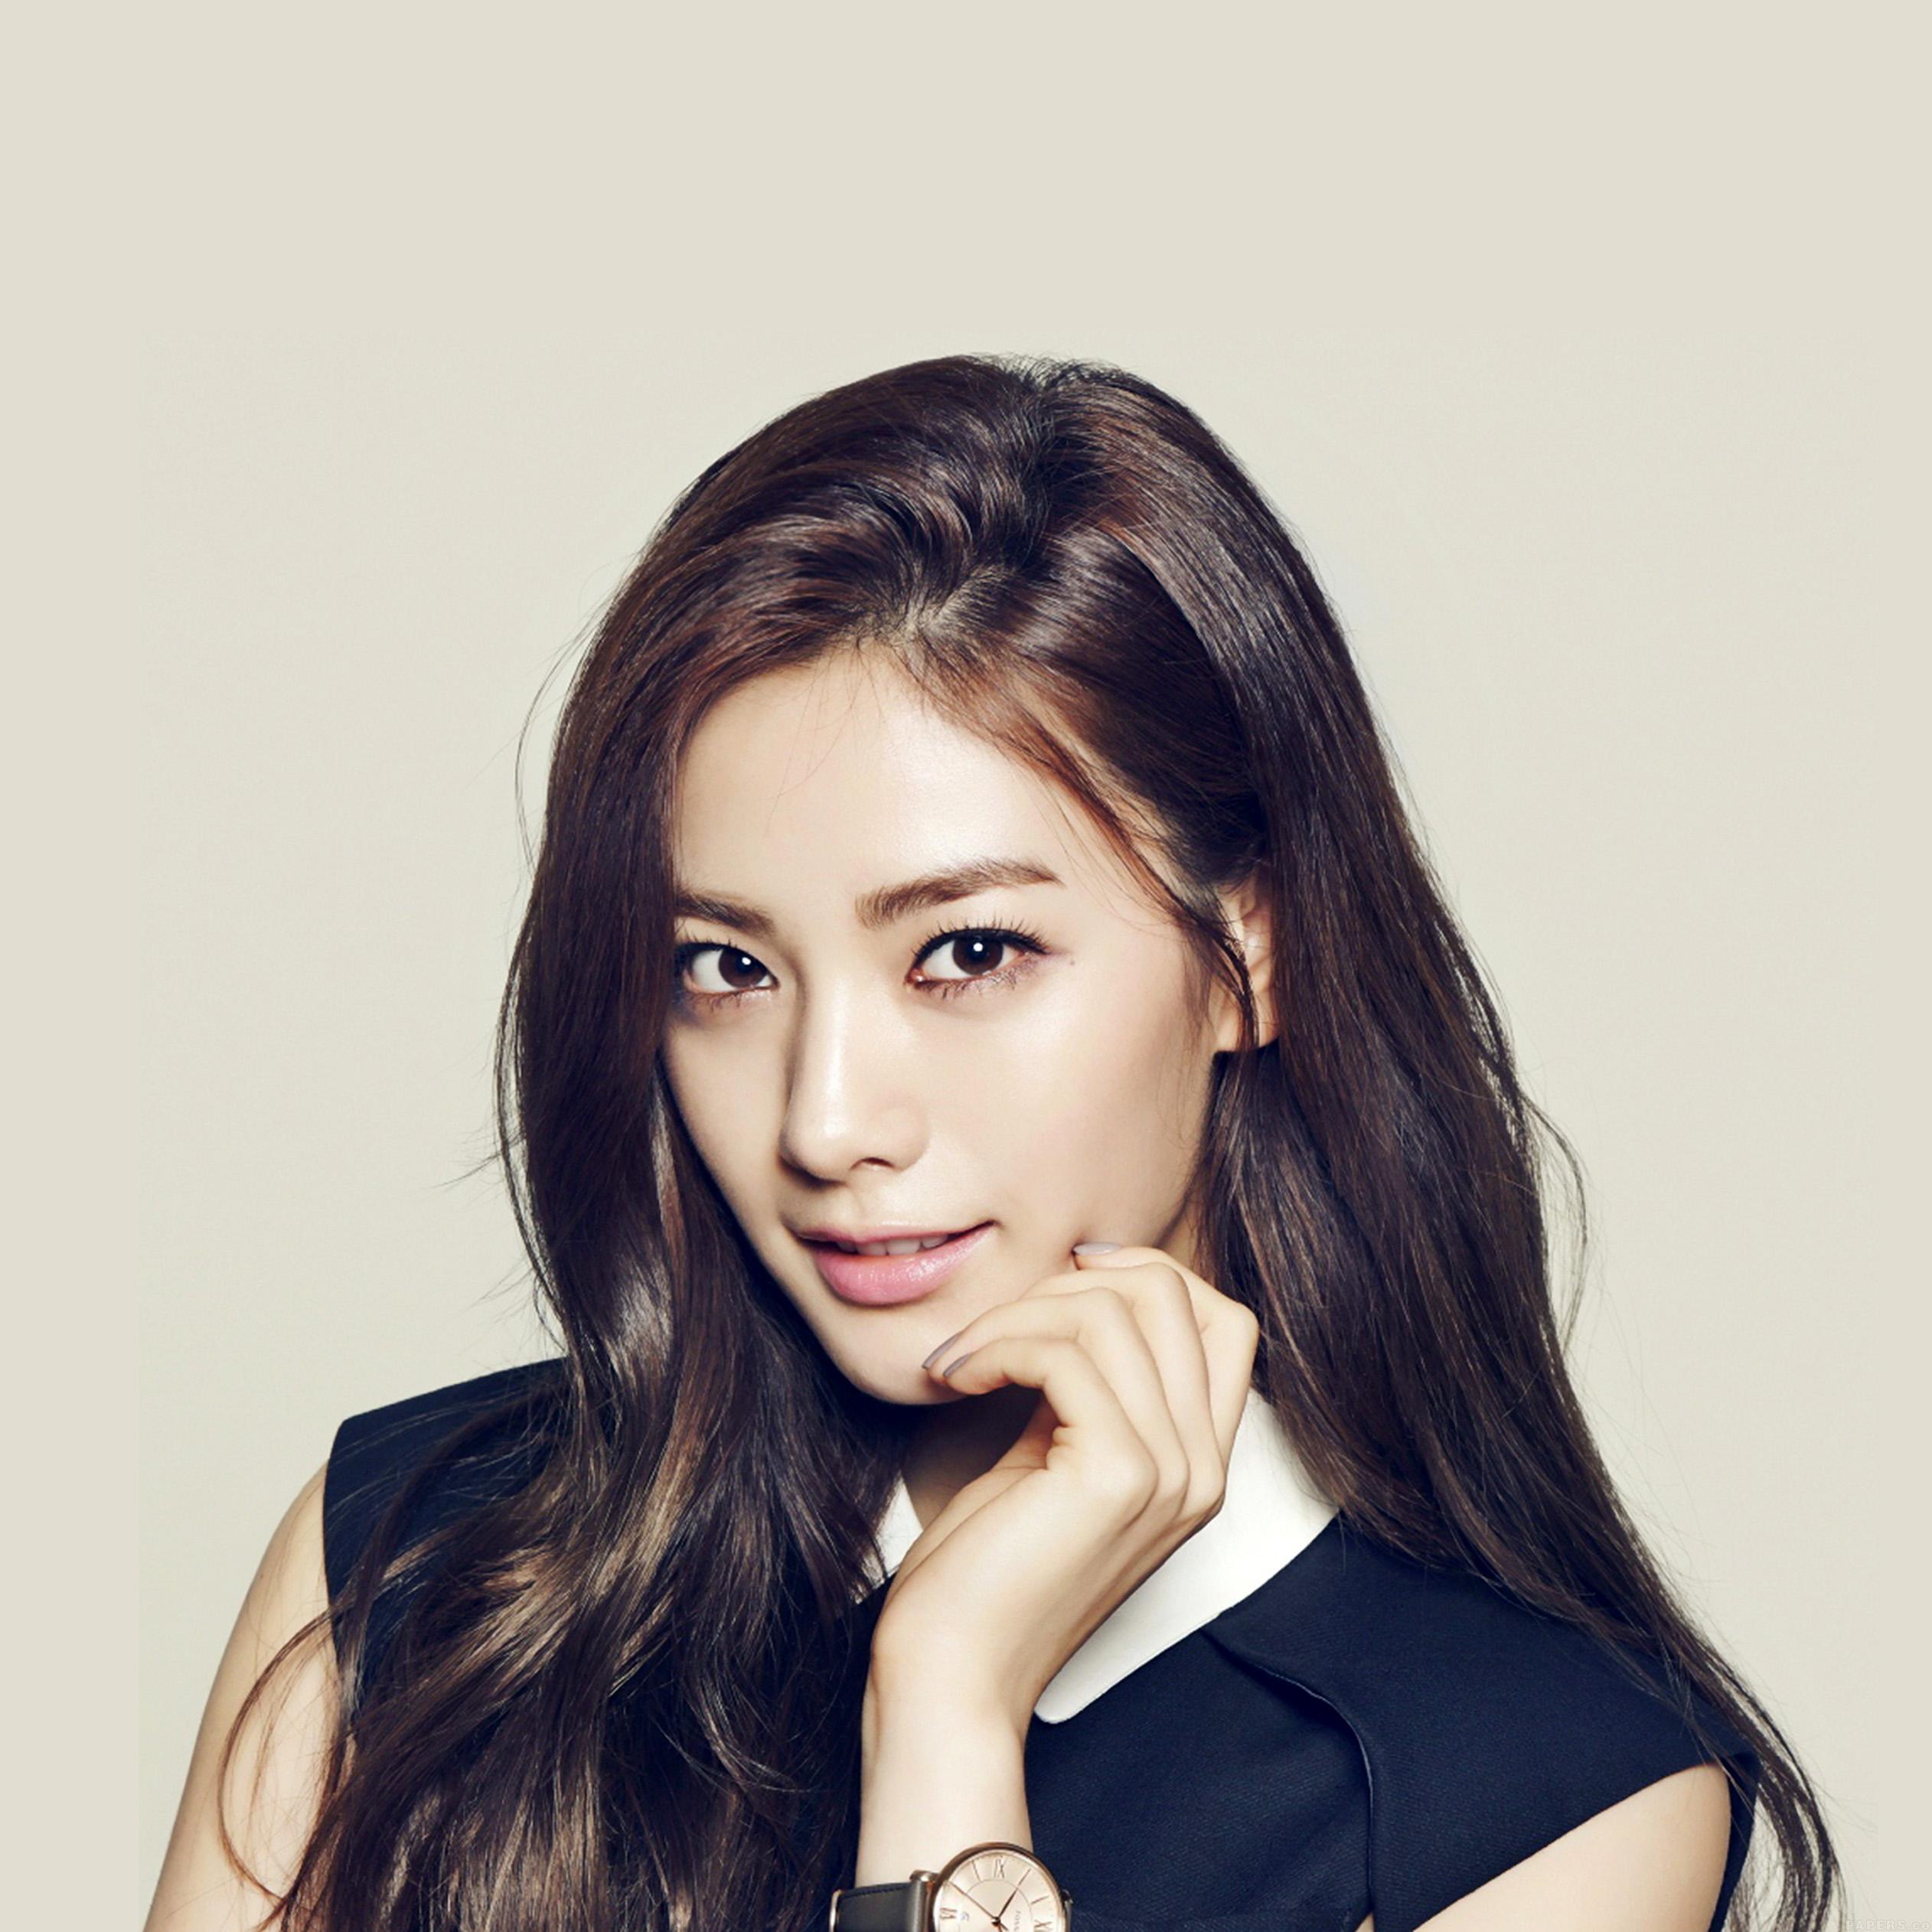 freeios7 hd61 nana kpop idol music sexy girl   parallax